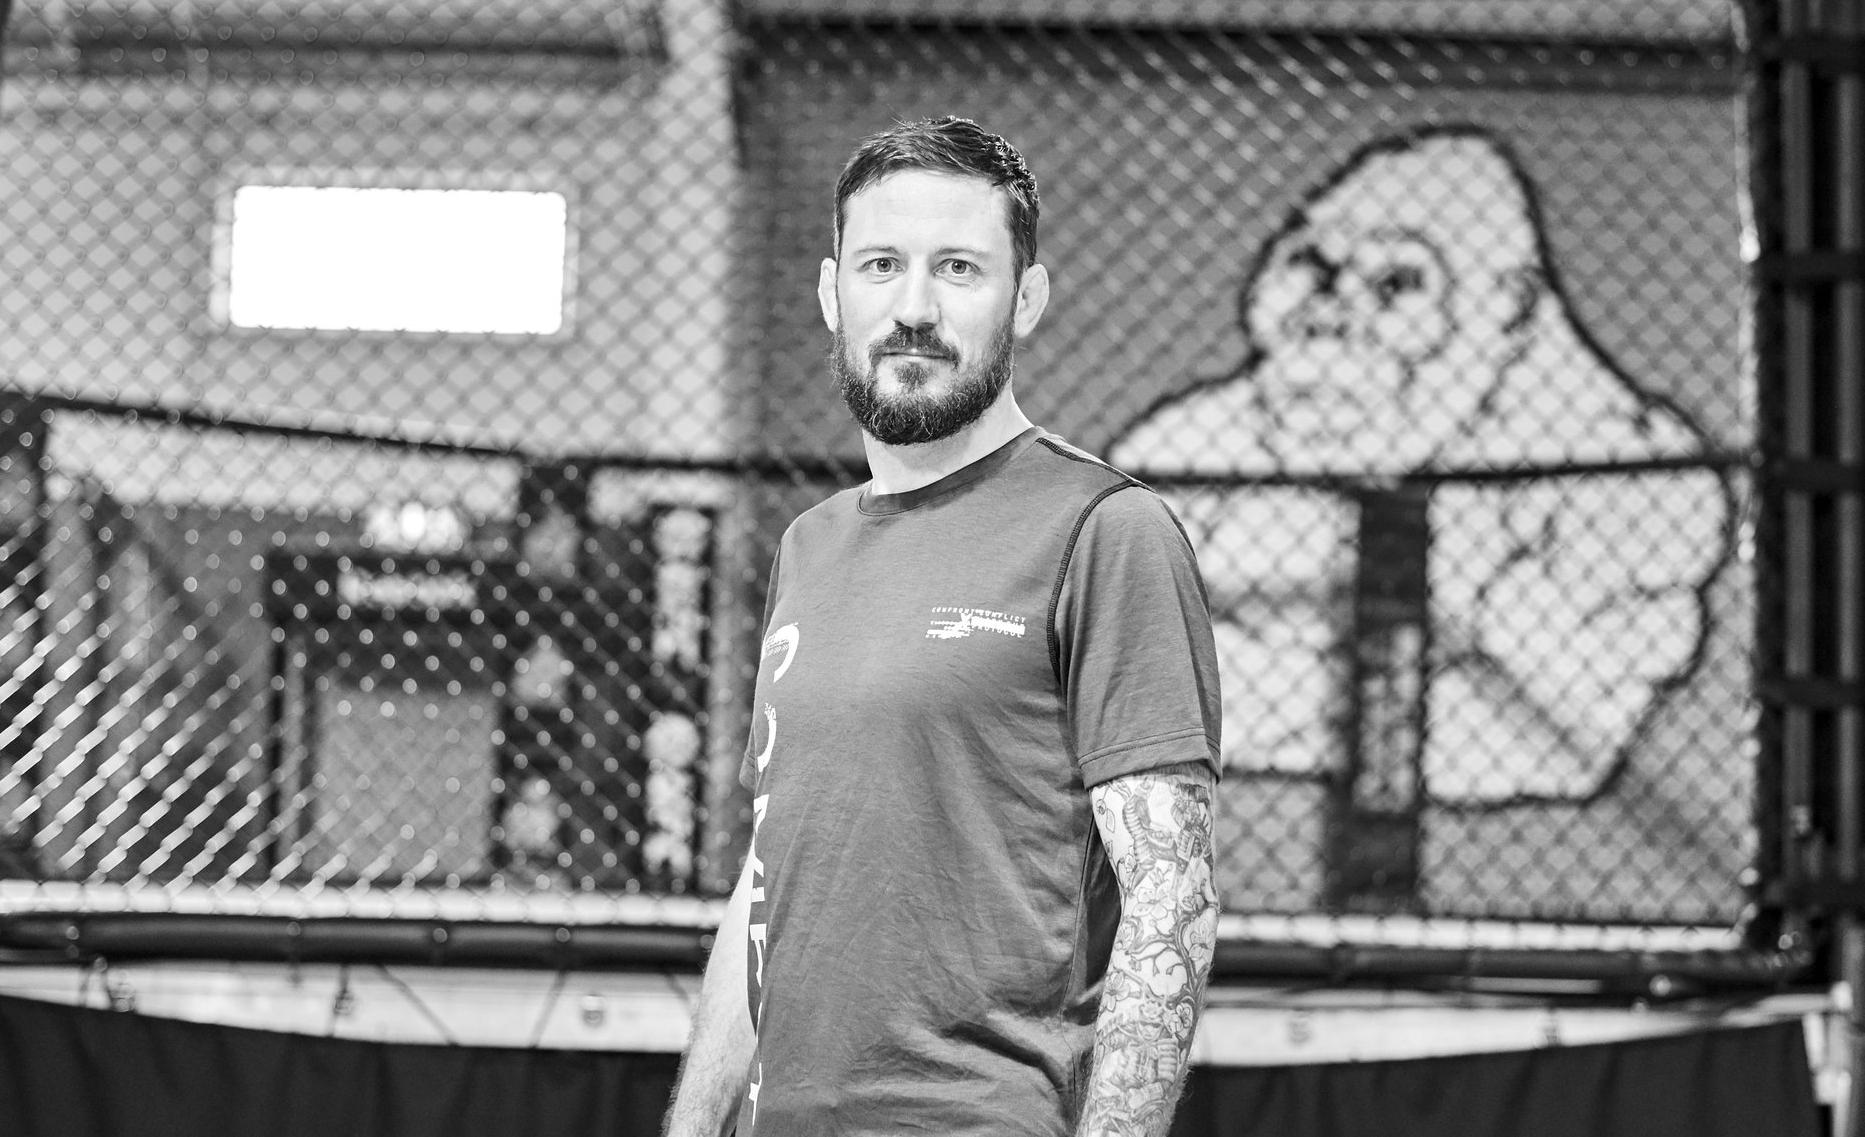 JOHN KAVANAGH  MMA Artist, Coach to Conor Mc Gregor & Owner SBG Gym   Instagram  |  Twitter  |  Facebook